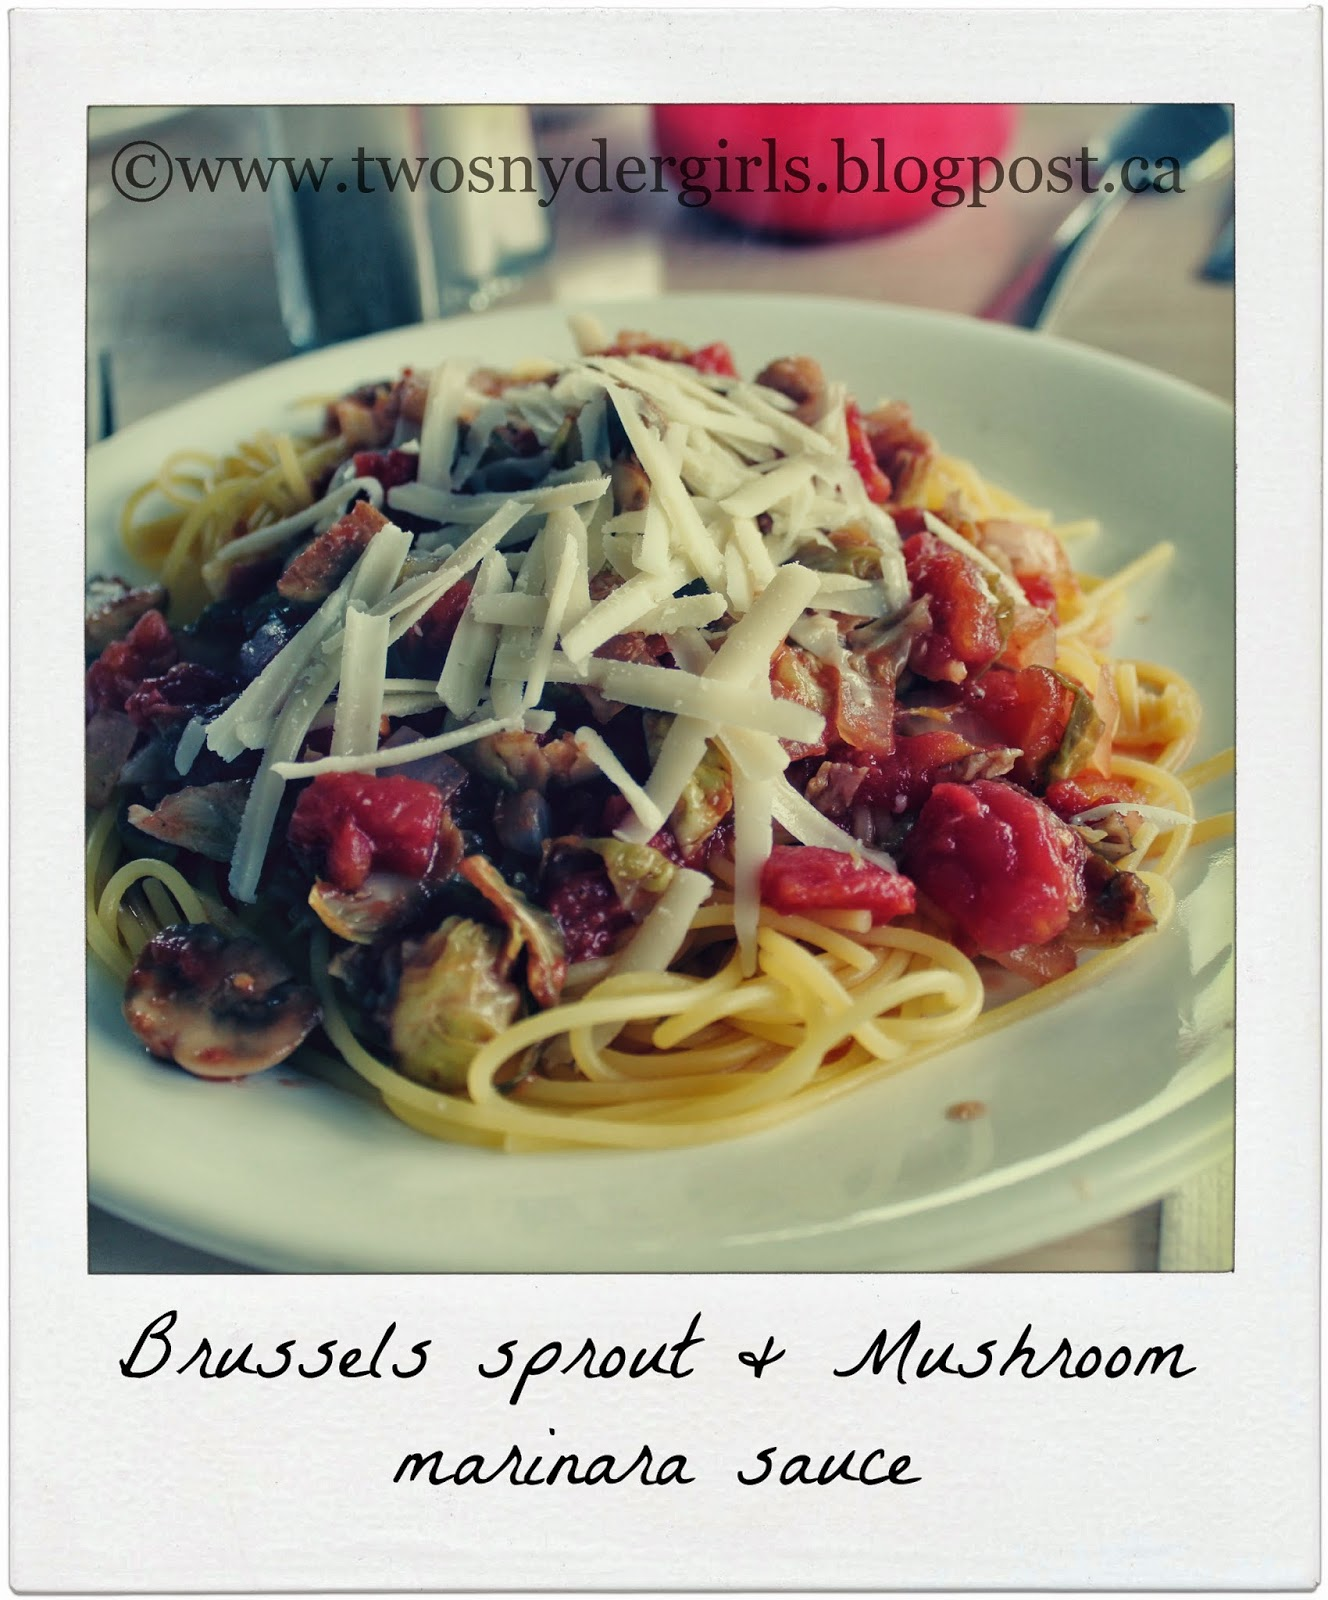 Brussels Sprout & Mushroom Marinara Sauce